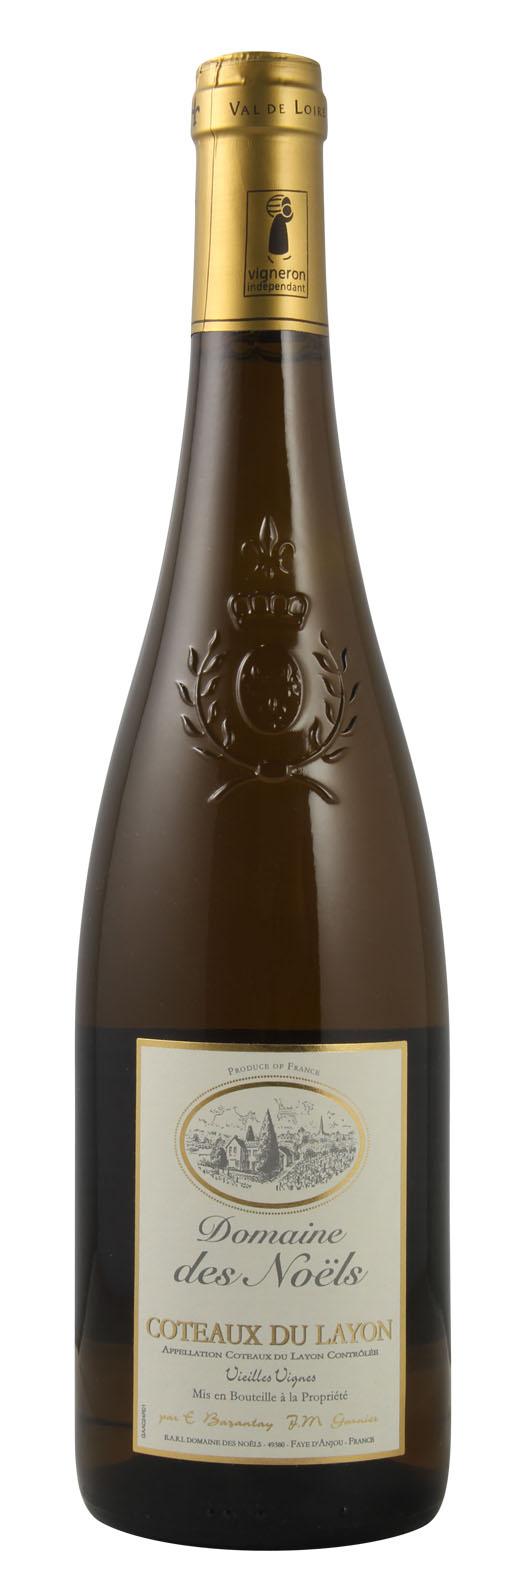 Coteau du Layon Wine Old Vines of the Christmas Domain